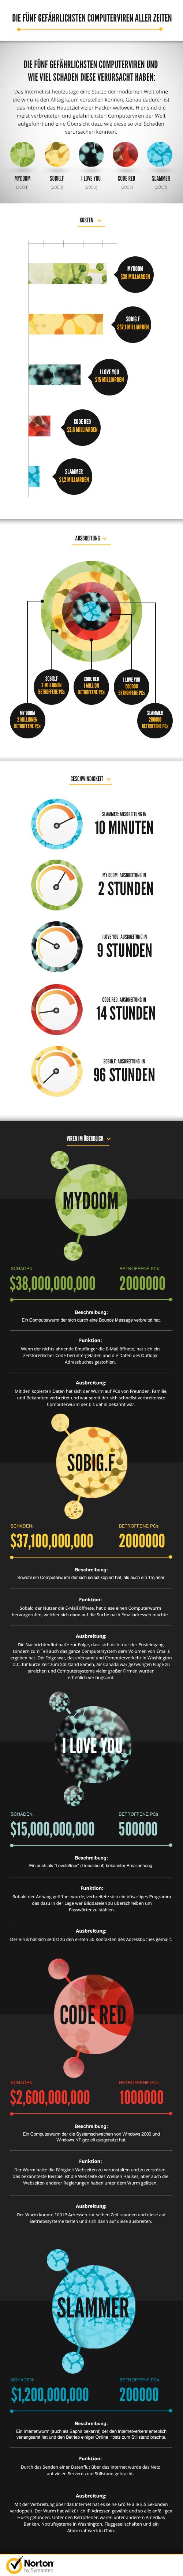 Norton-Infografik-Computerviren-High Resolution